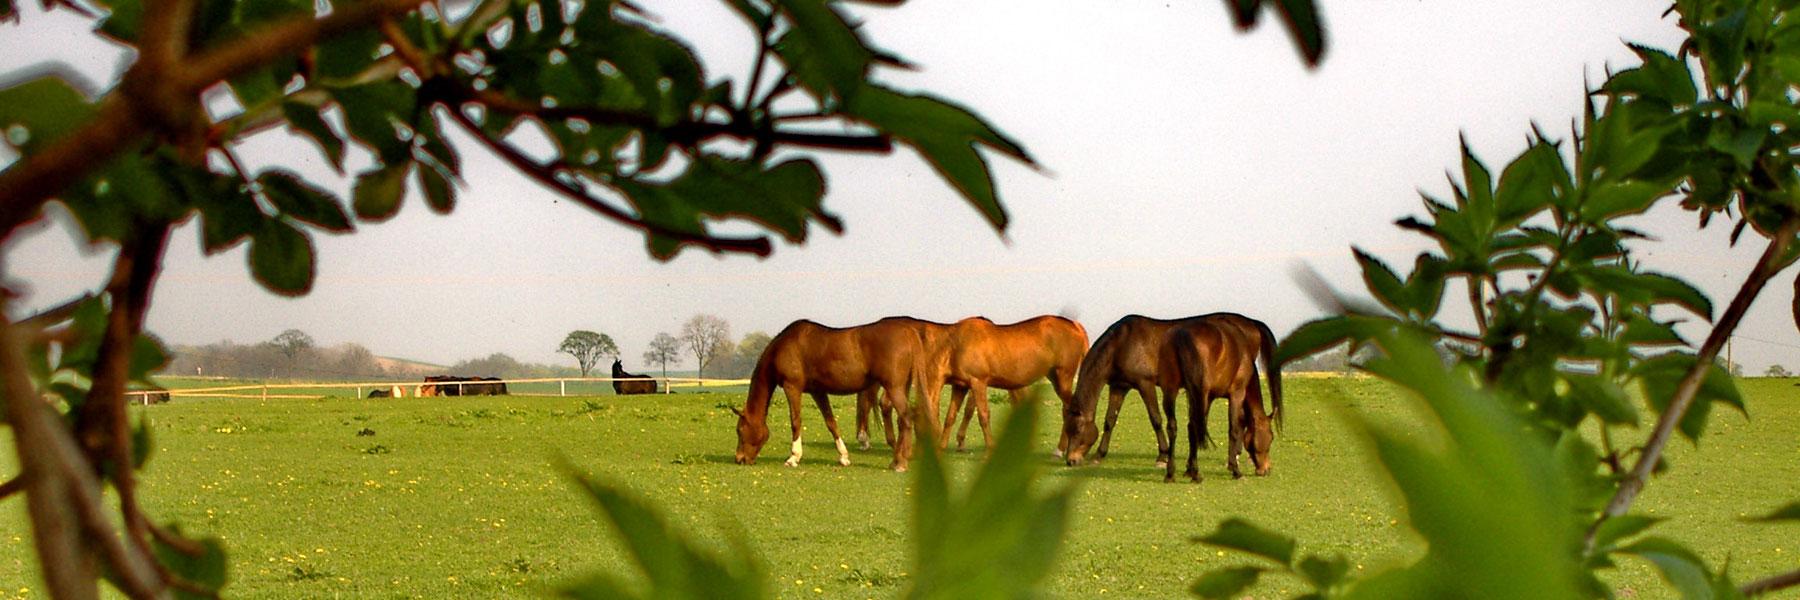 Pferdewiese - Landgut Lischow